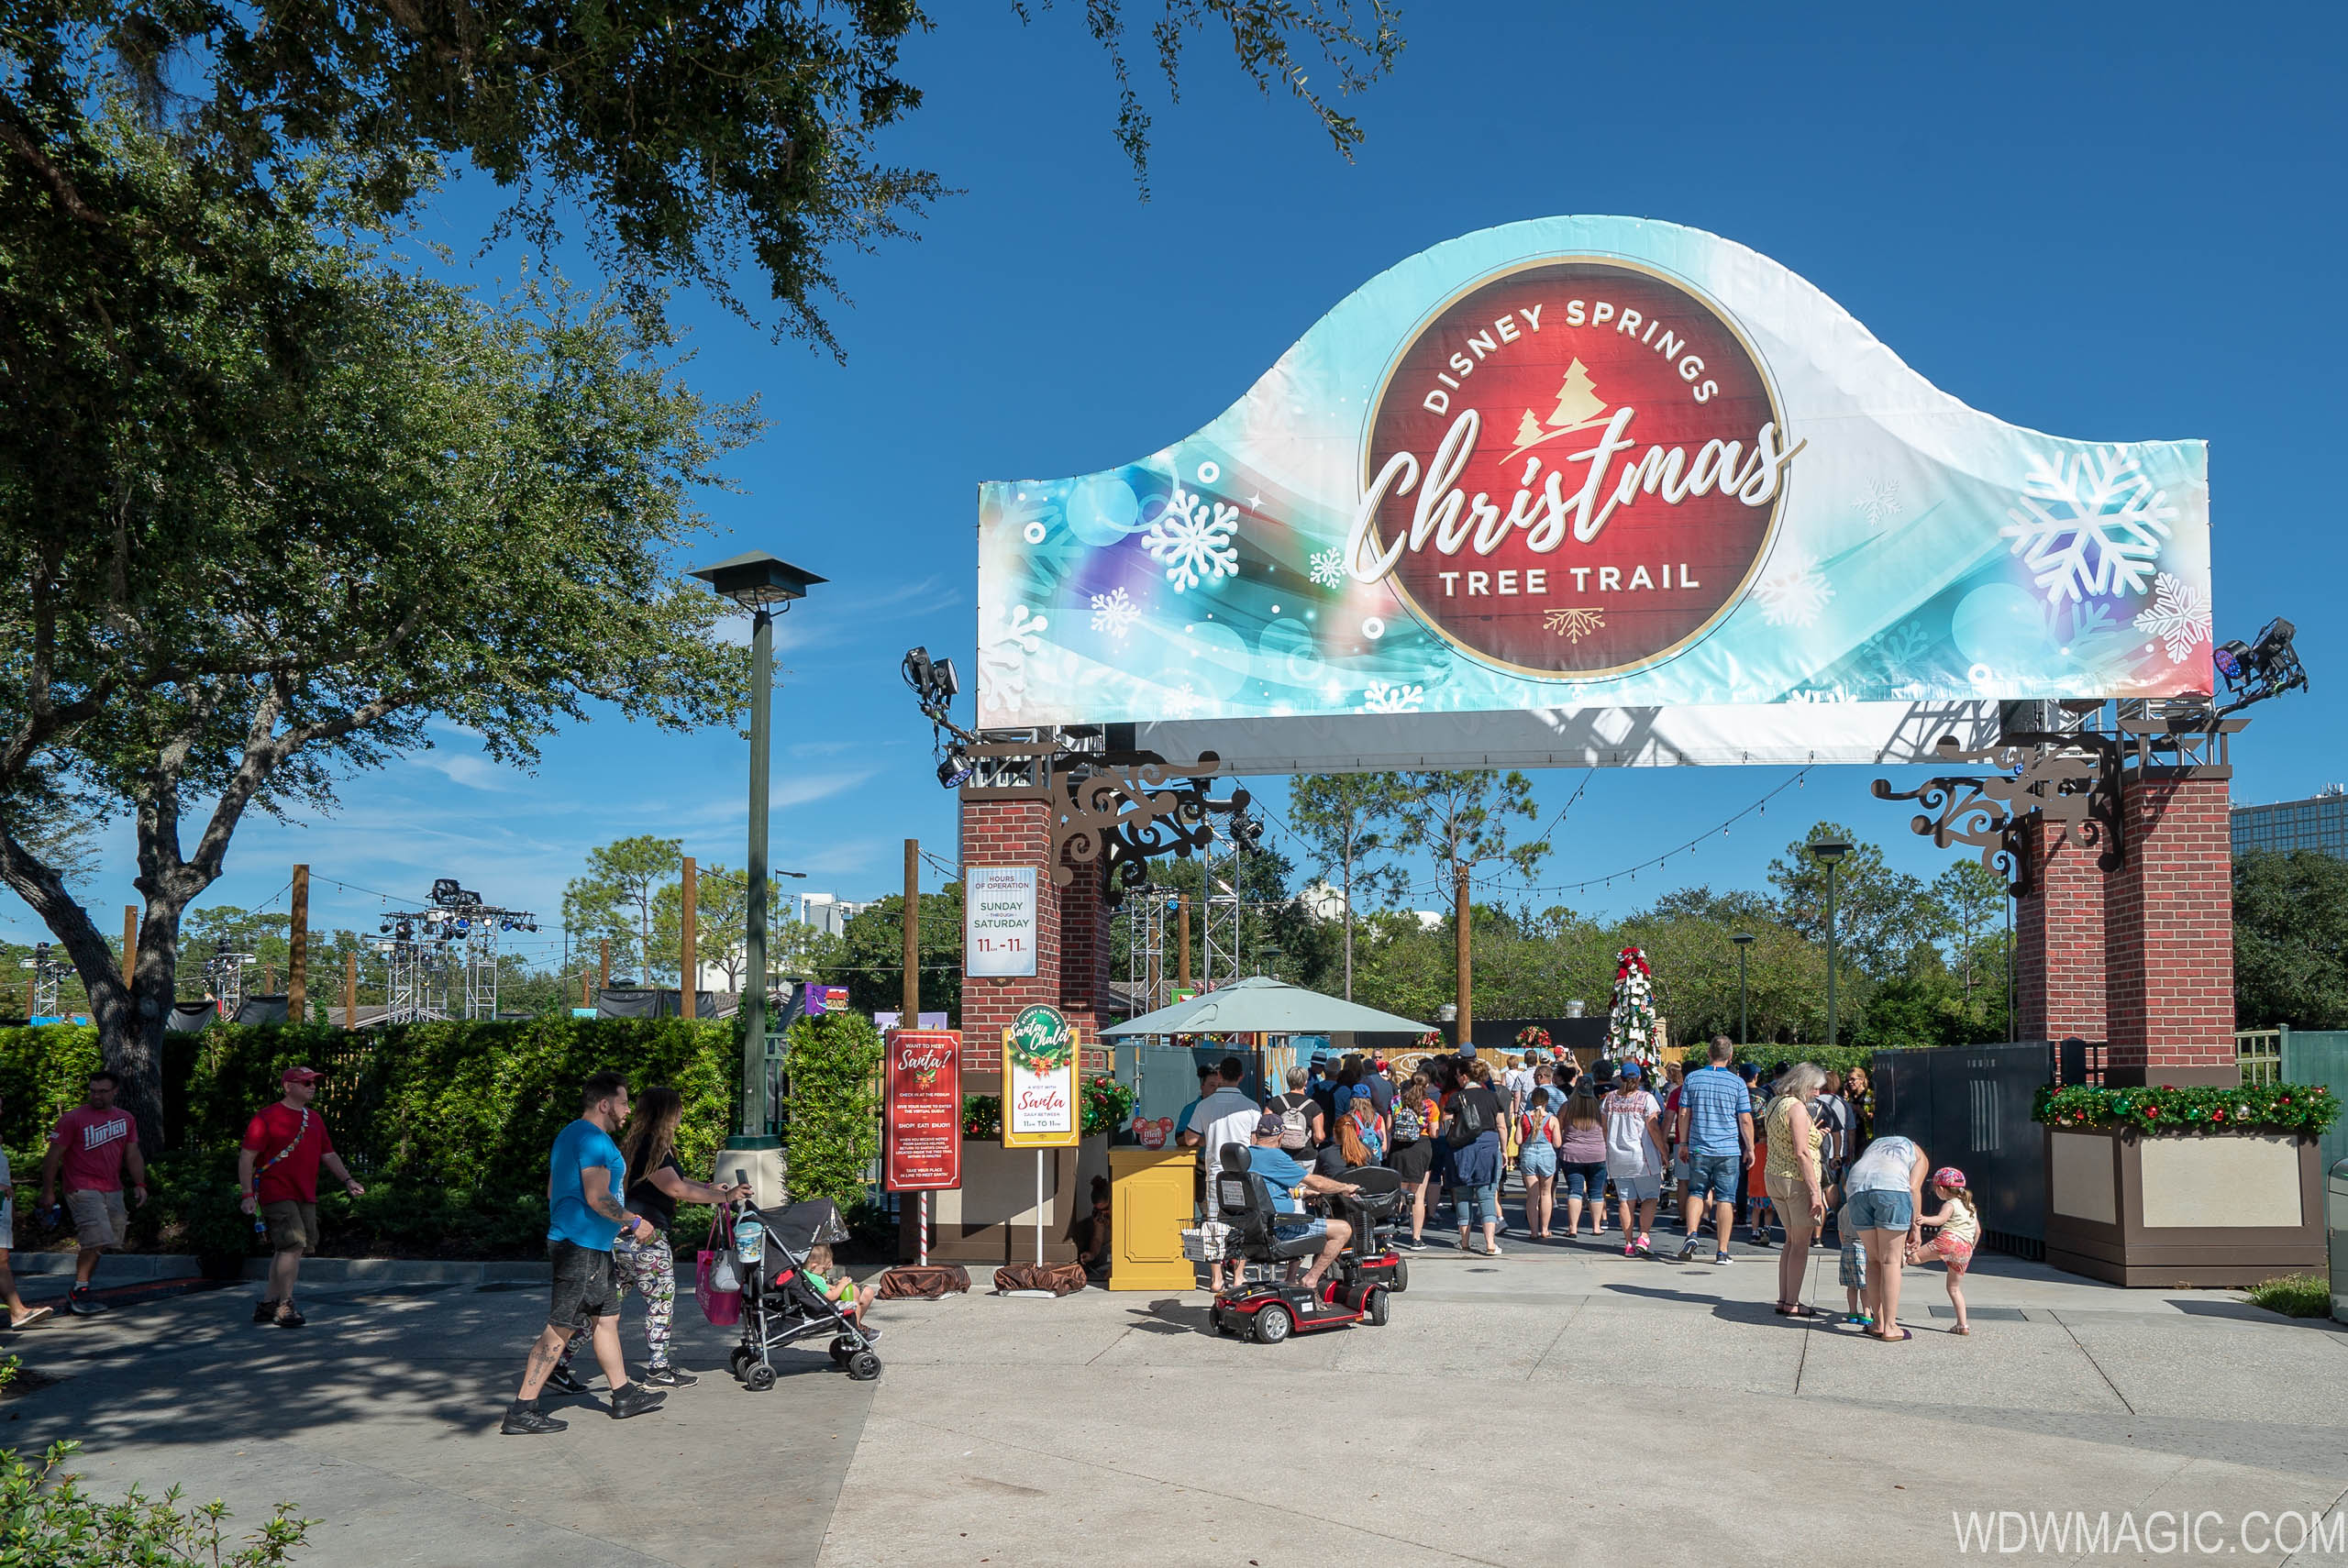 Disney Springs Christmas Tree Trail 2018